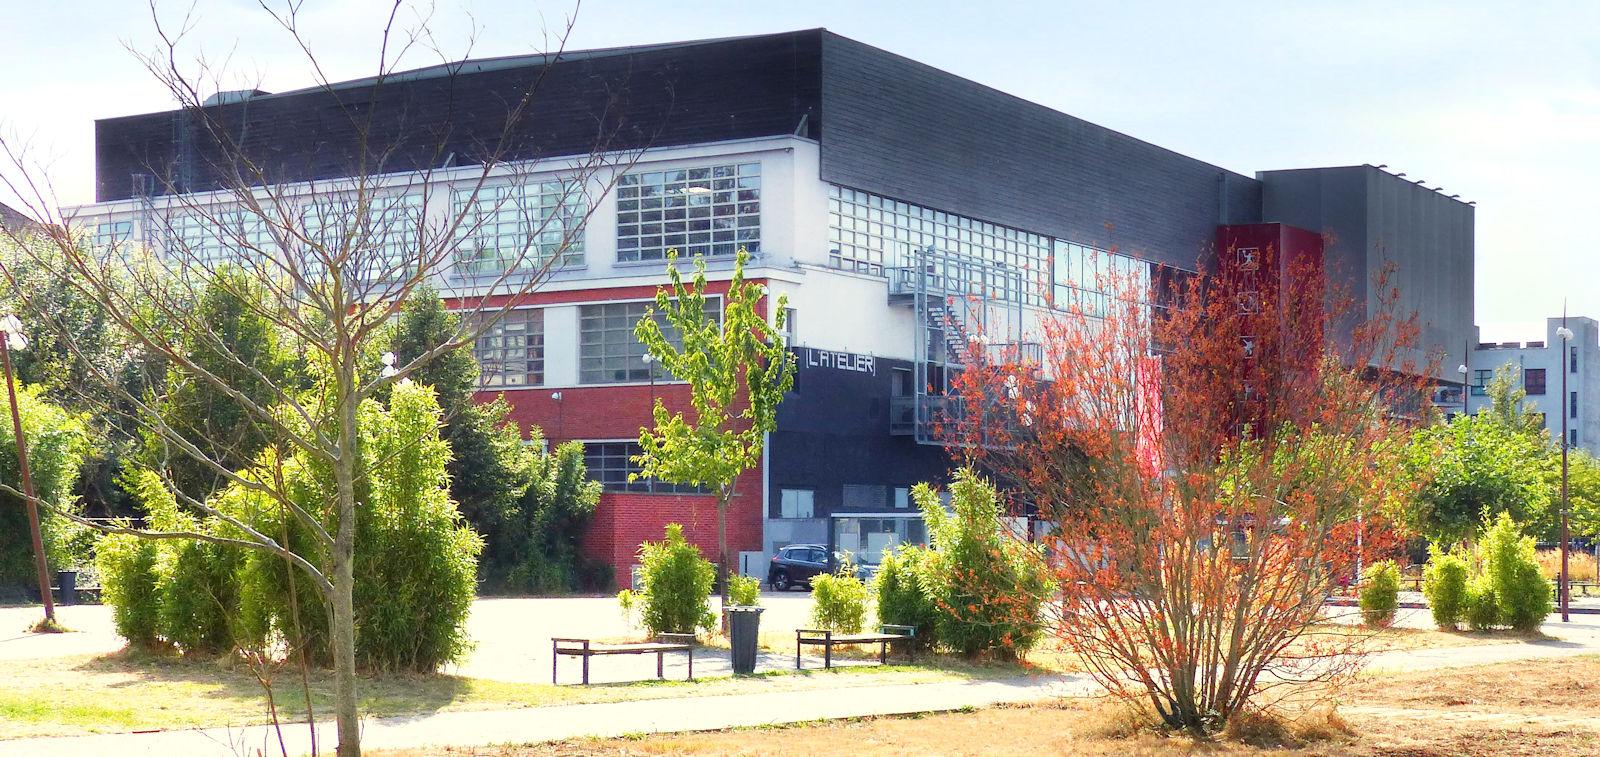 Complexe Sportif L'Atelier - Tourcoing Virolois.